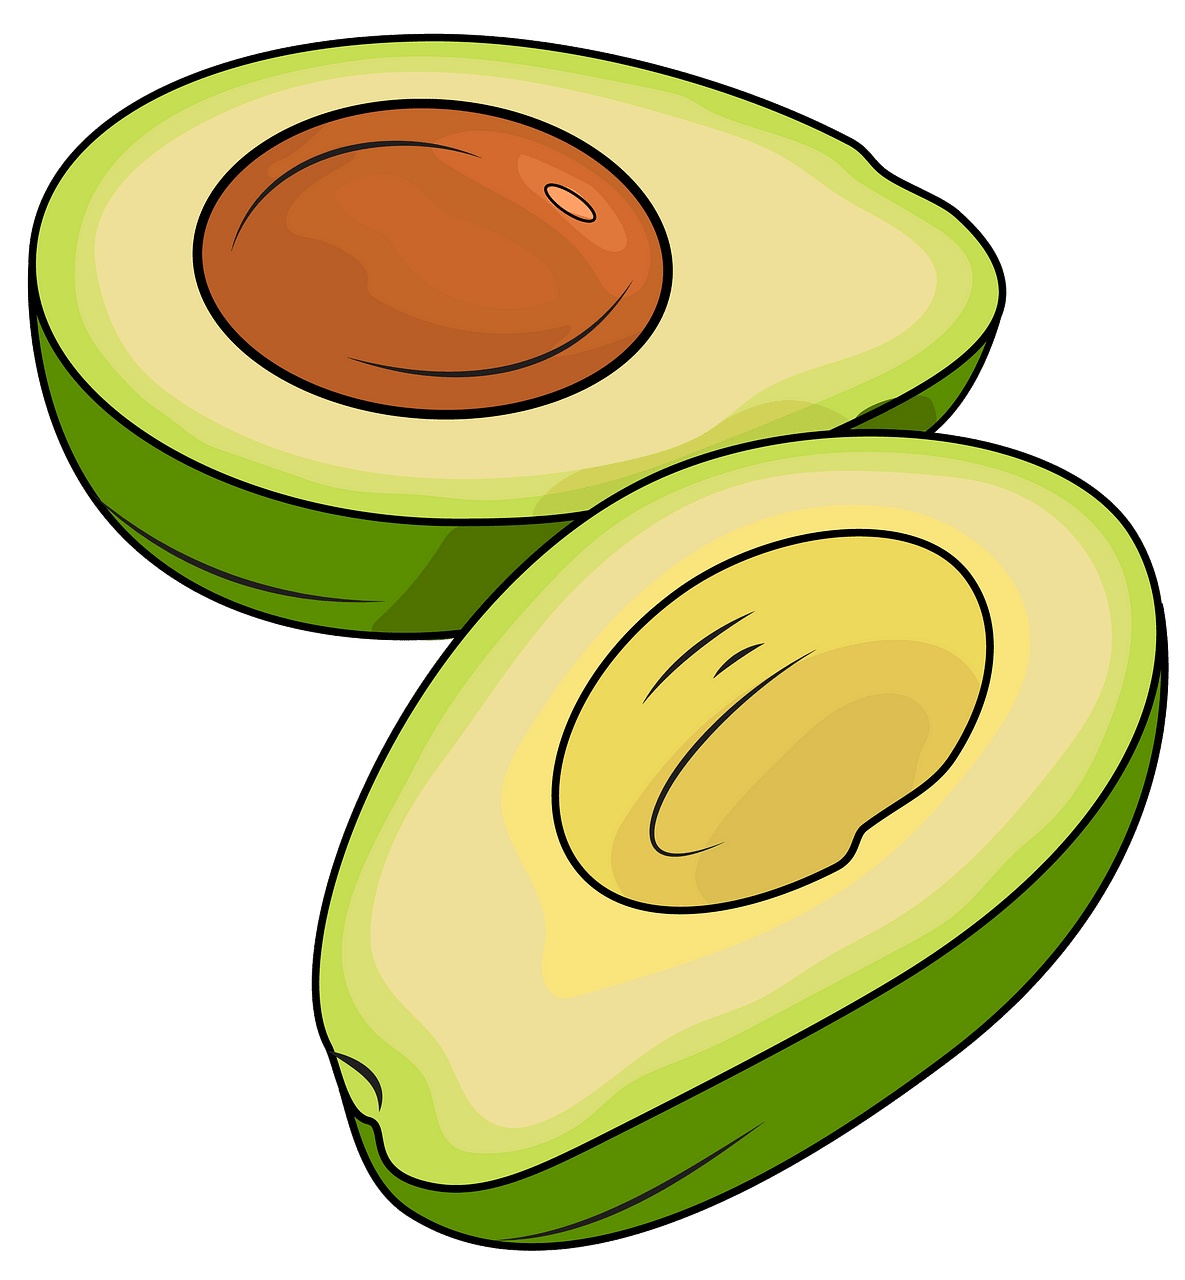 Avocado cut in half clipart. Free download..